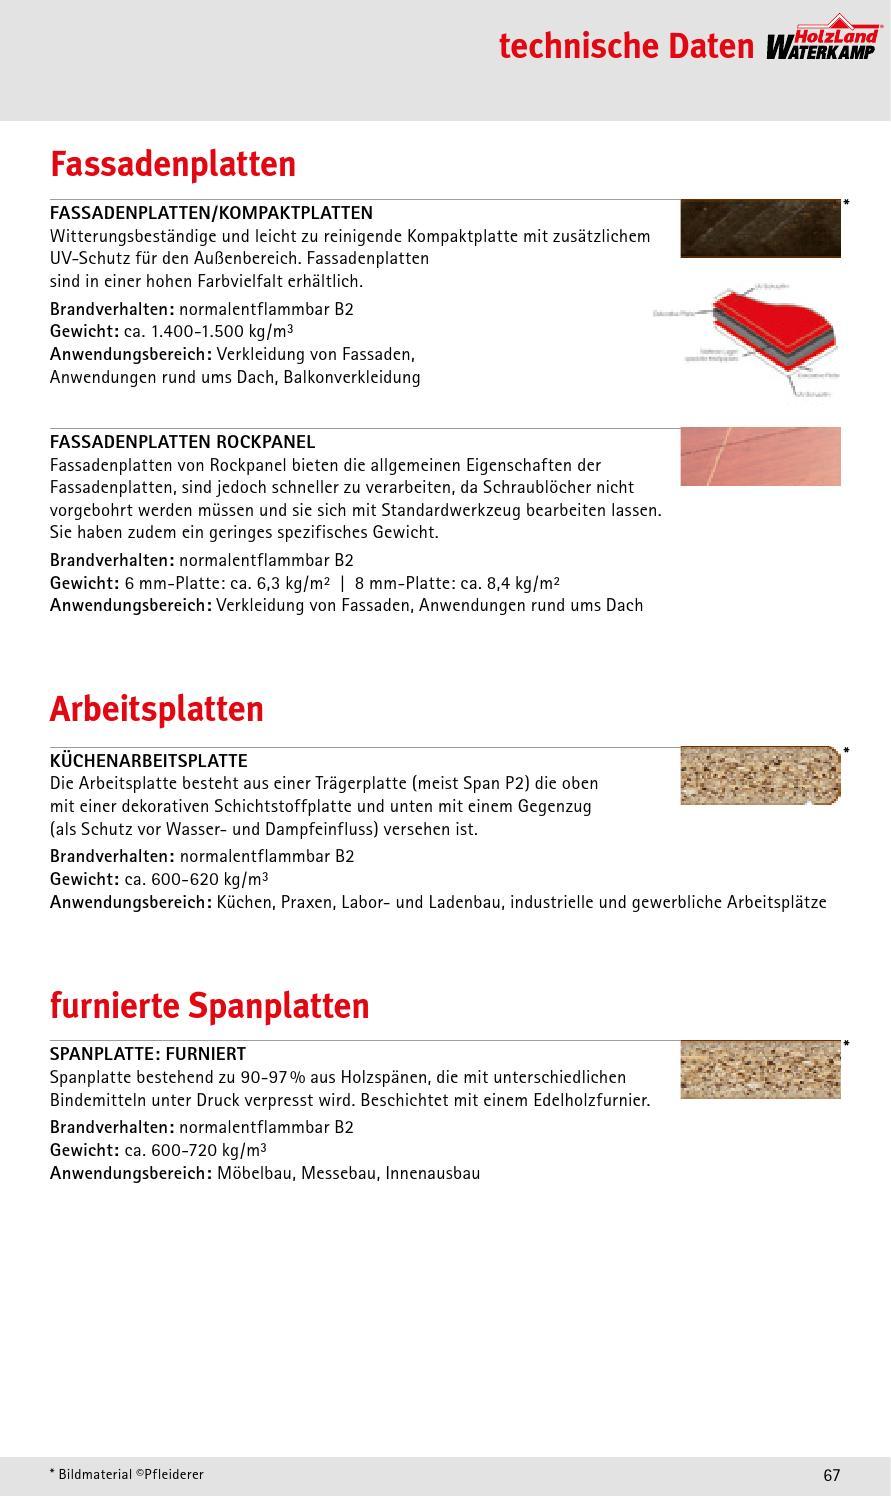 Holzland Waterkamp Platten Spezial By Kaiser Design Issuu